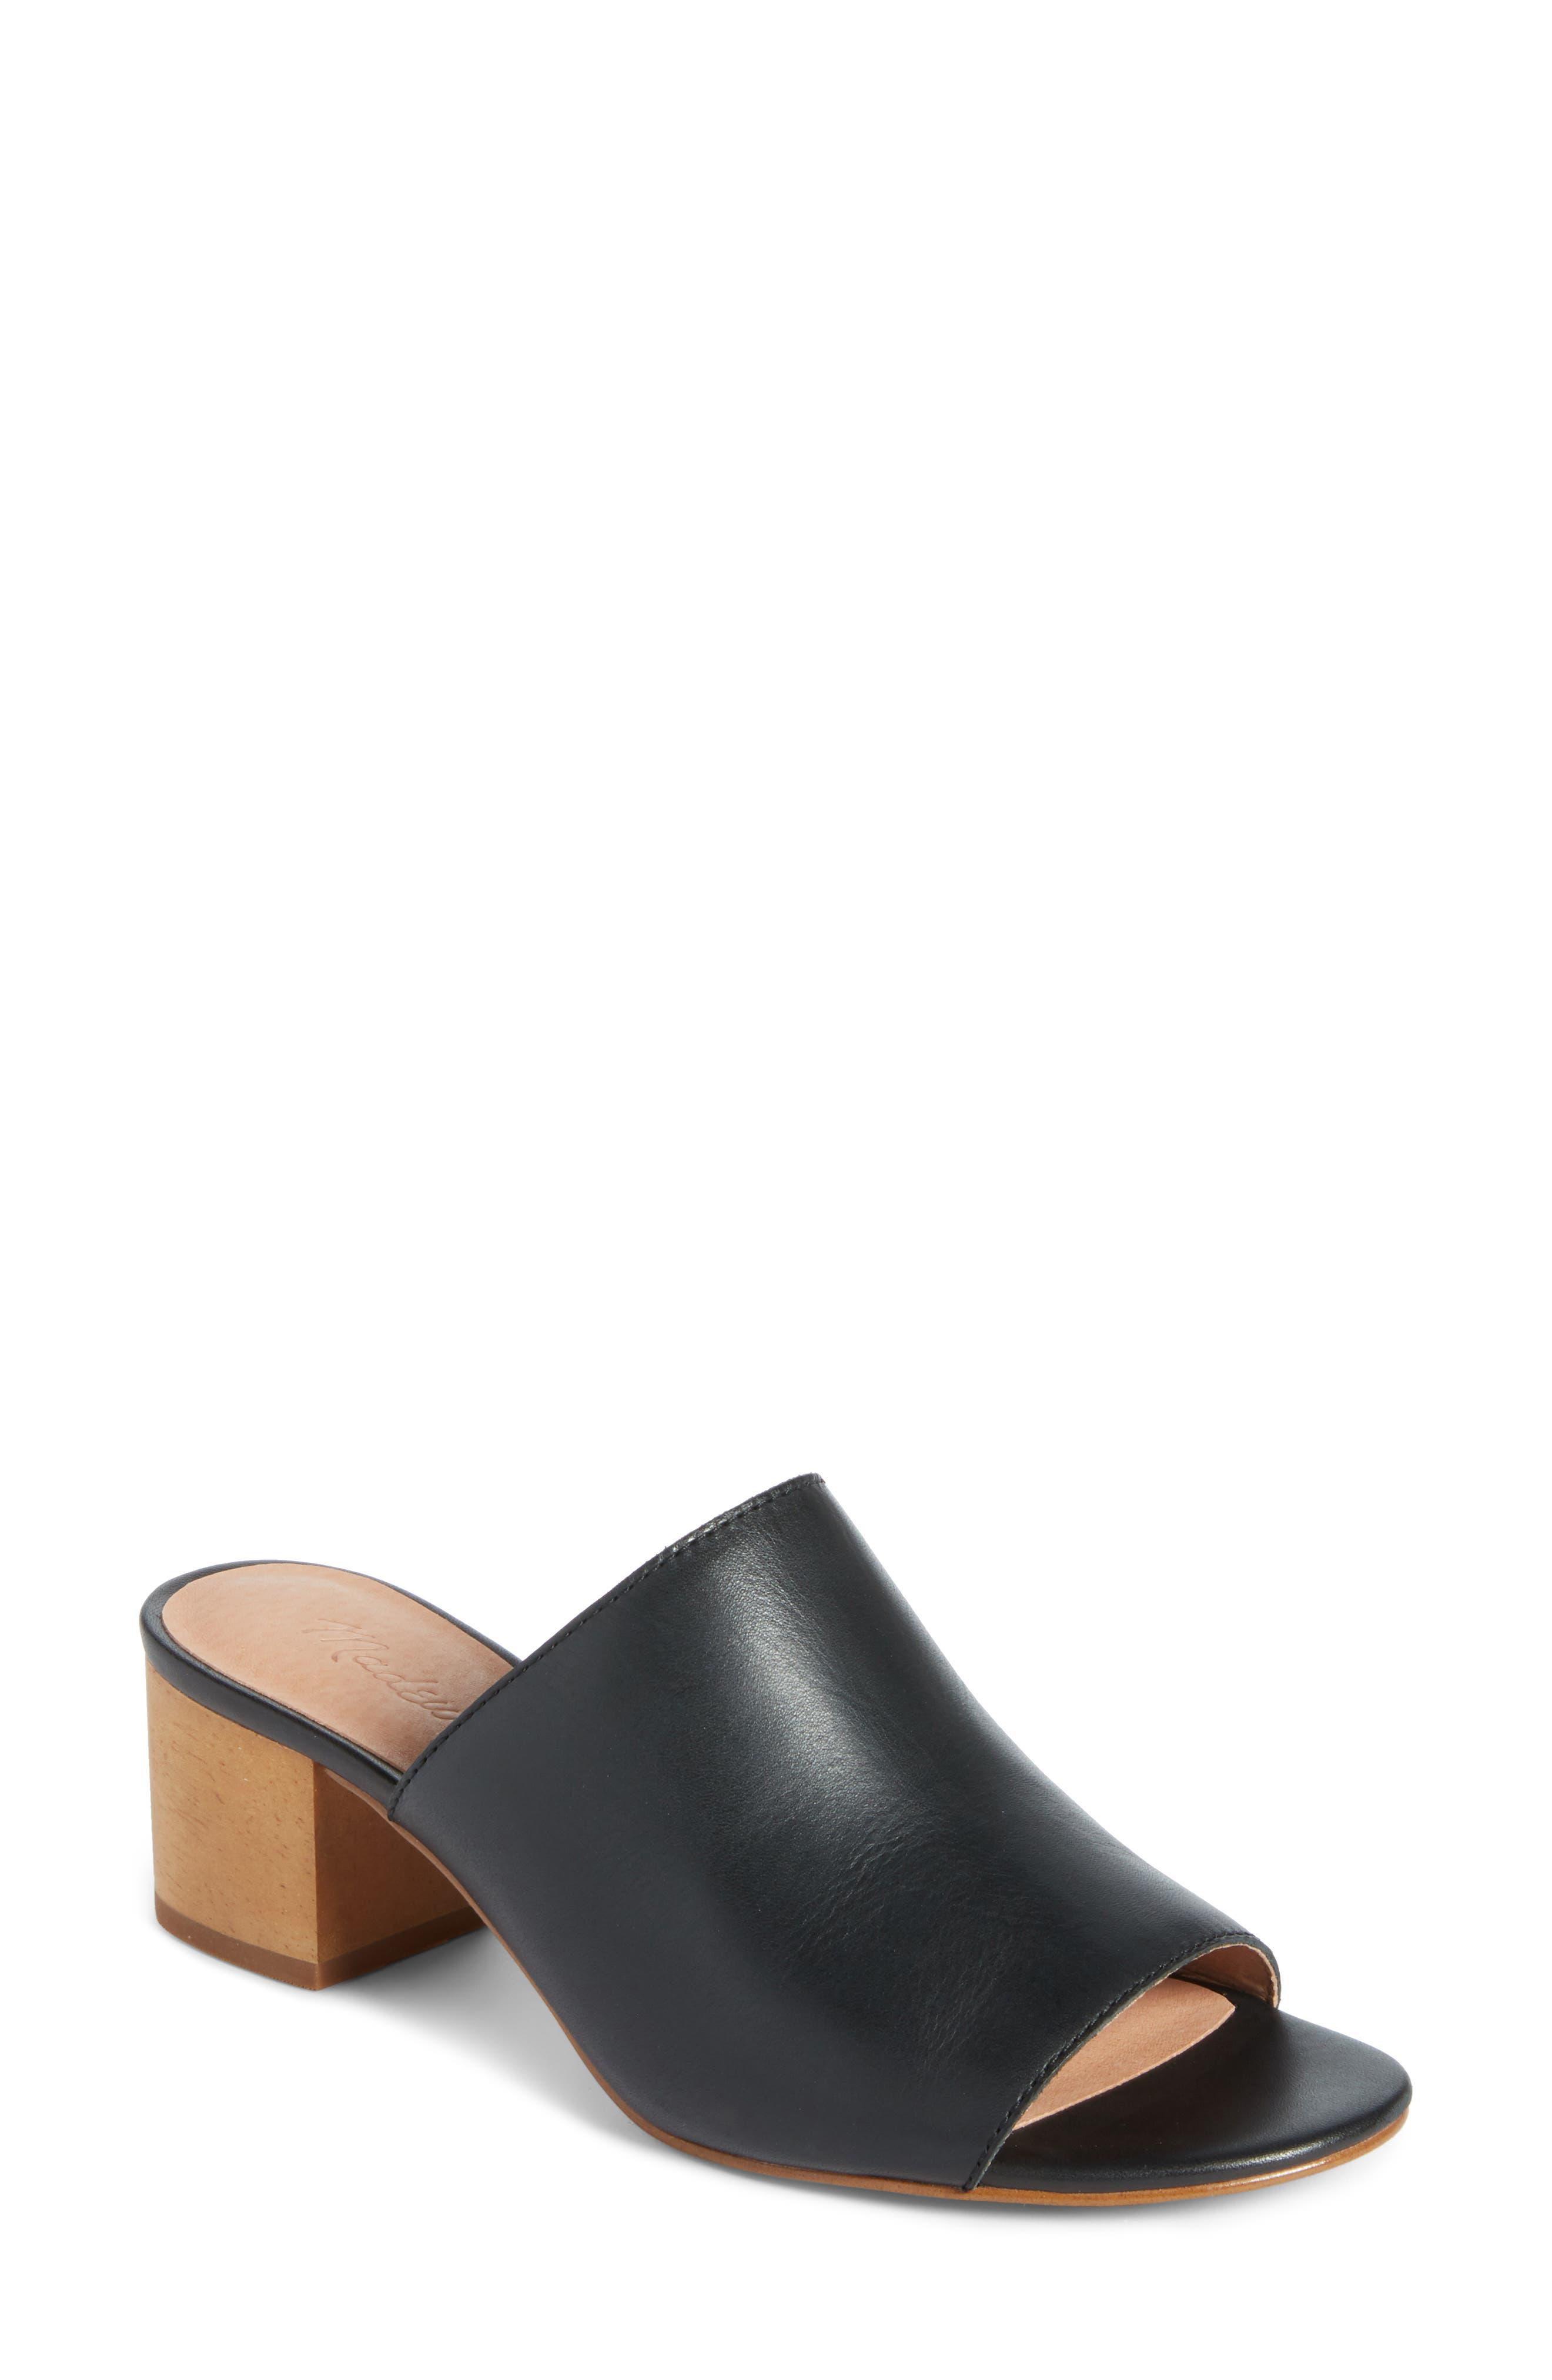 Deco Snake Print Leather Criss Cross Strap Slide Sandals RmMbNQkFSZ